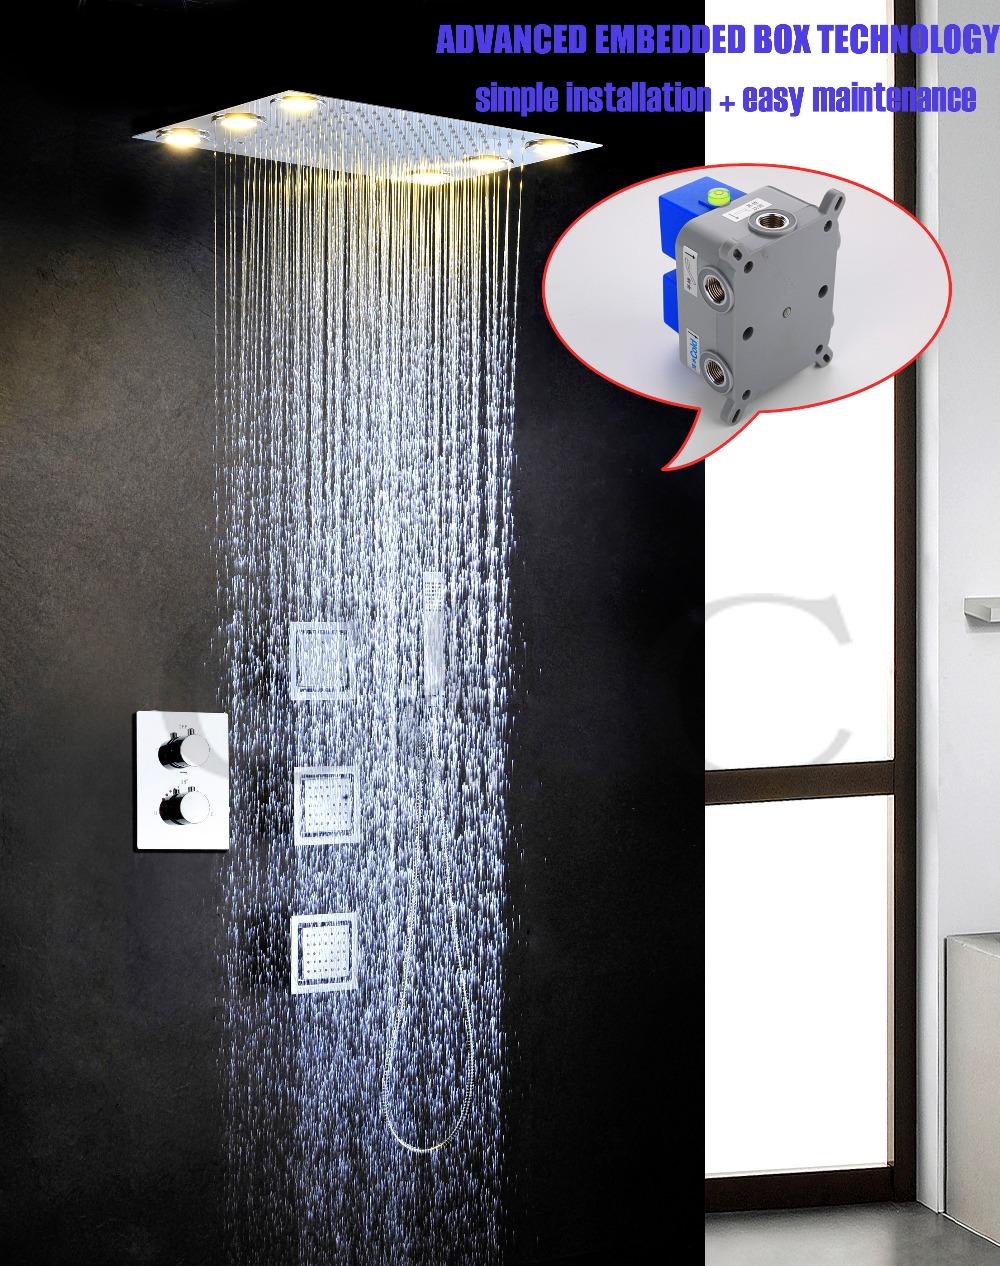 badezimmer installation 28 images vde badezimmer installation elvenbride badezimmer